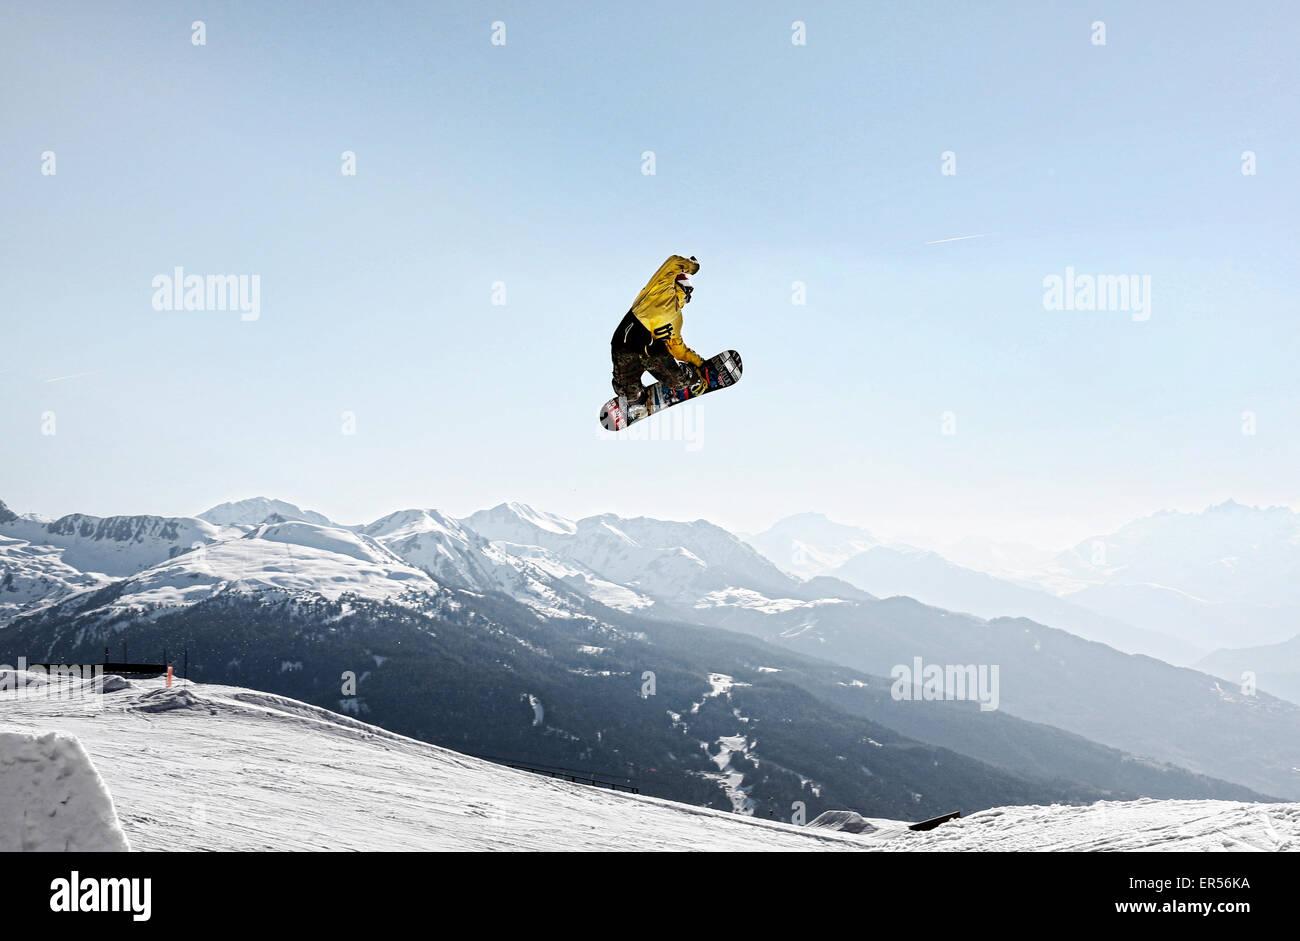 Snow boarder at Les Arcs - Stock Image